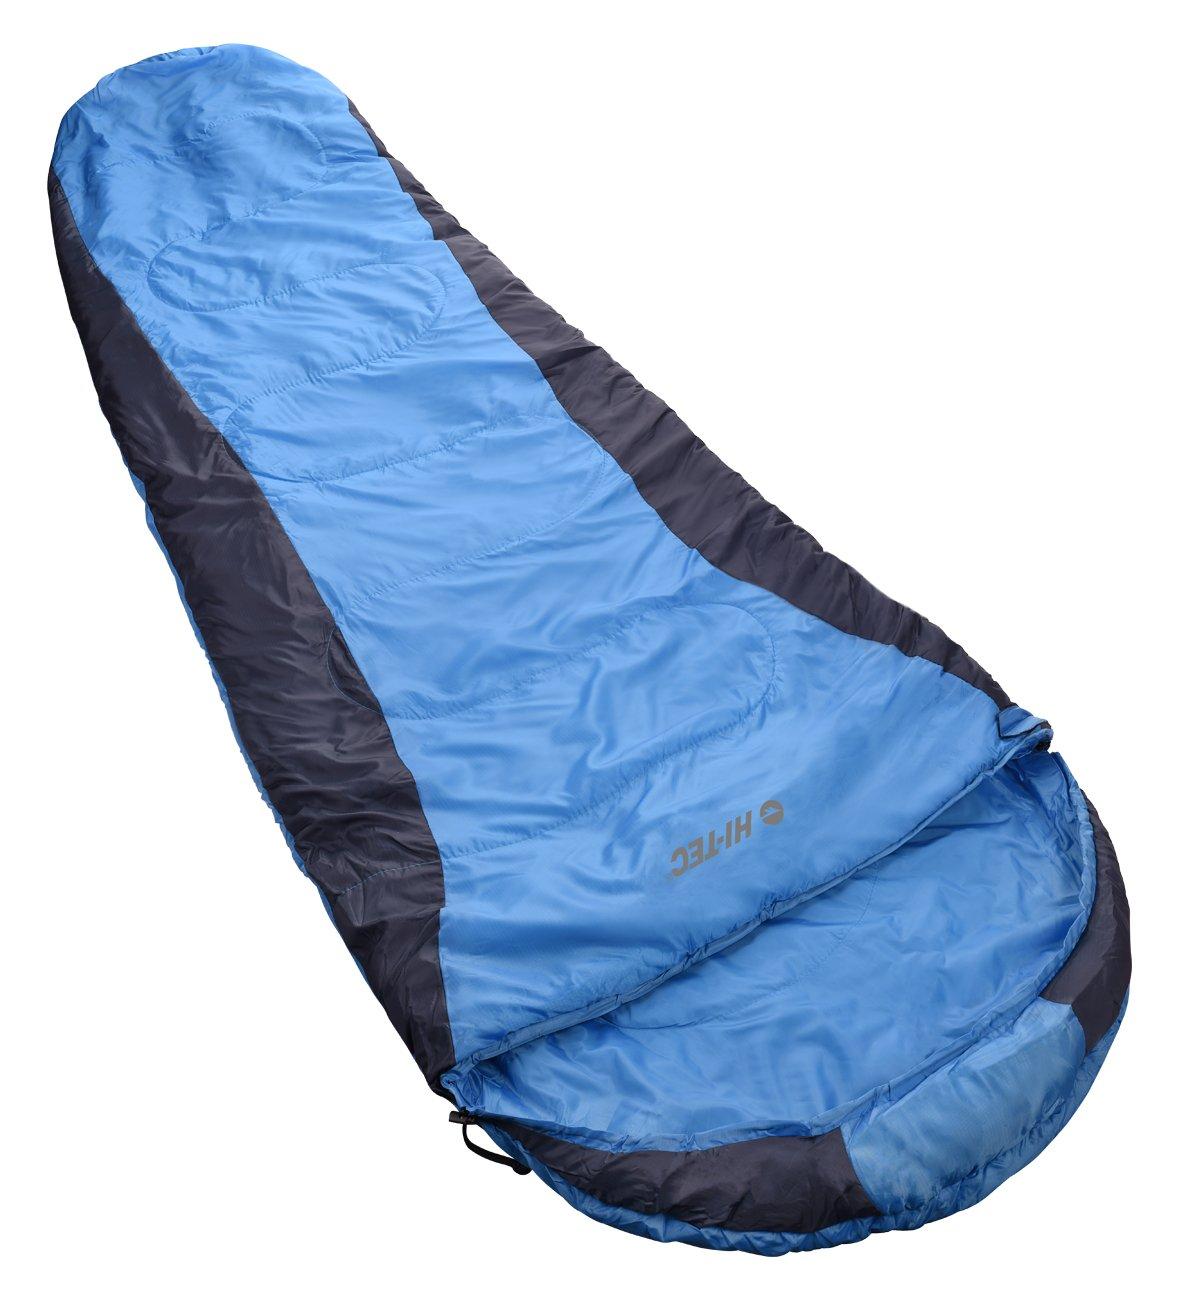 Hi-Tec ARRE Sleeping Bags, Blue/Navy, ONE Size